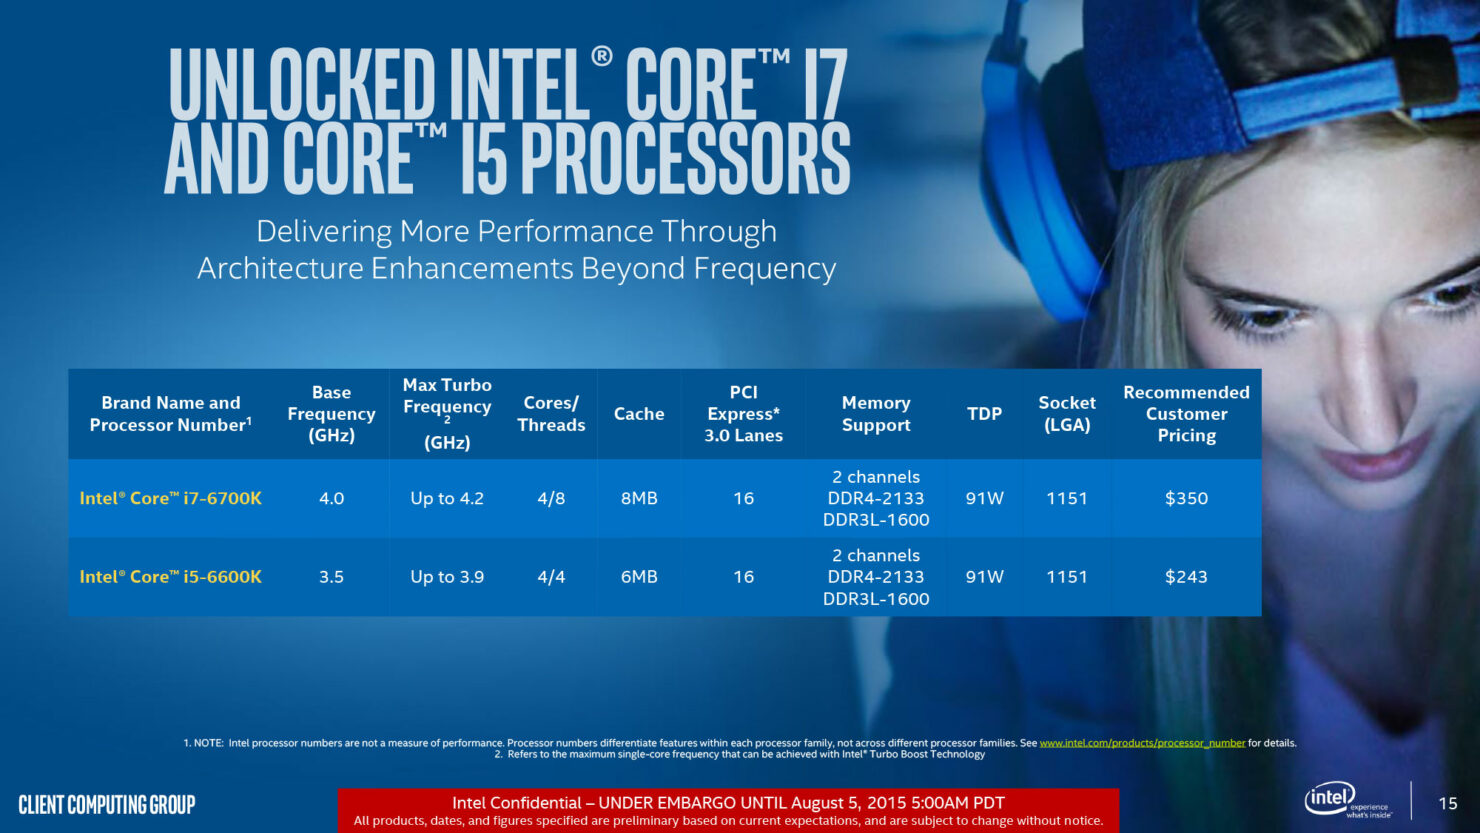 intel-skylake-core-i7-6700k-and-core-i5-6600k-specifications